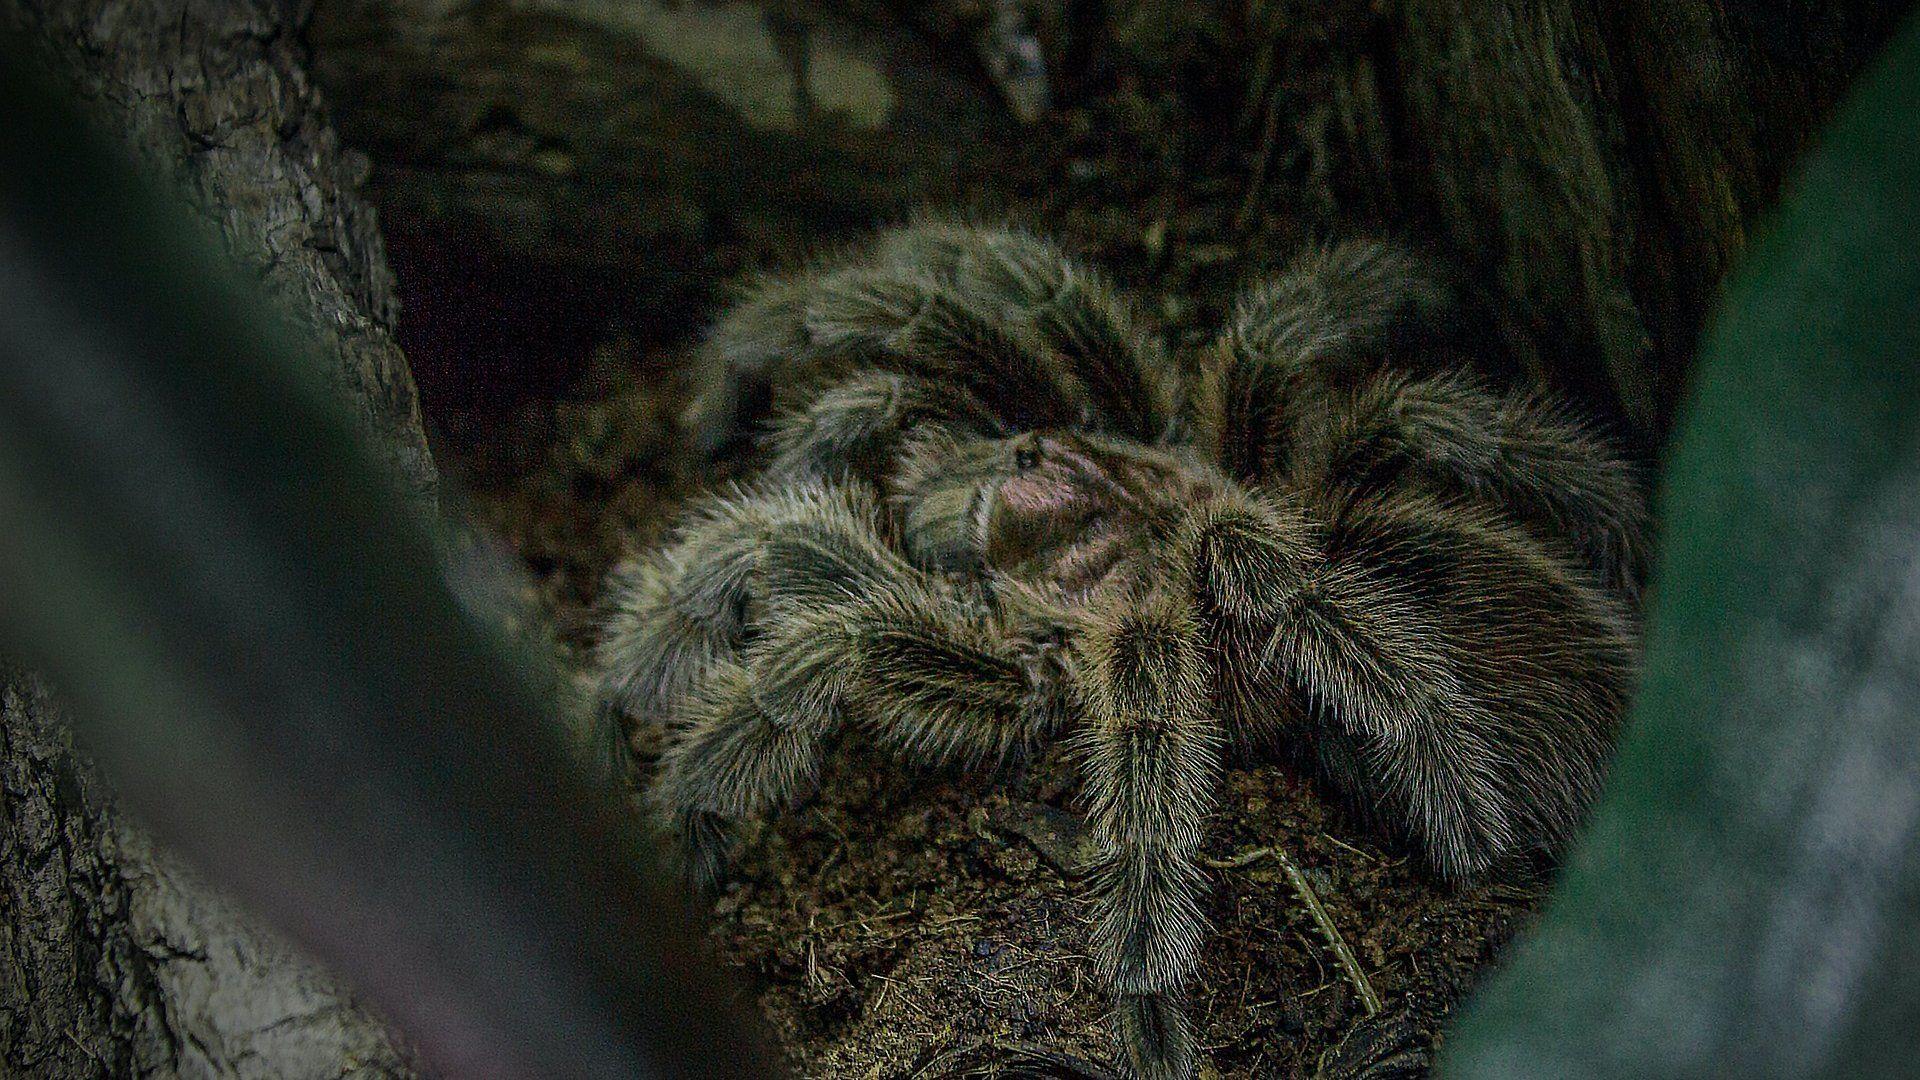 Chilei rózsaszín tarantula